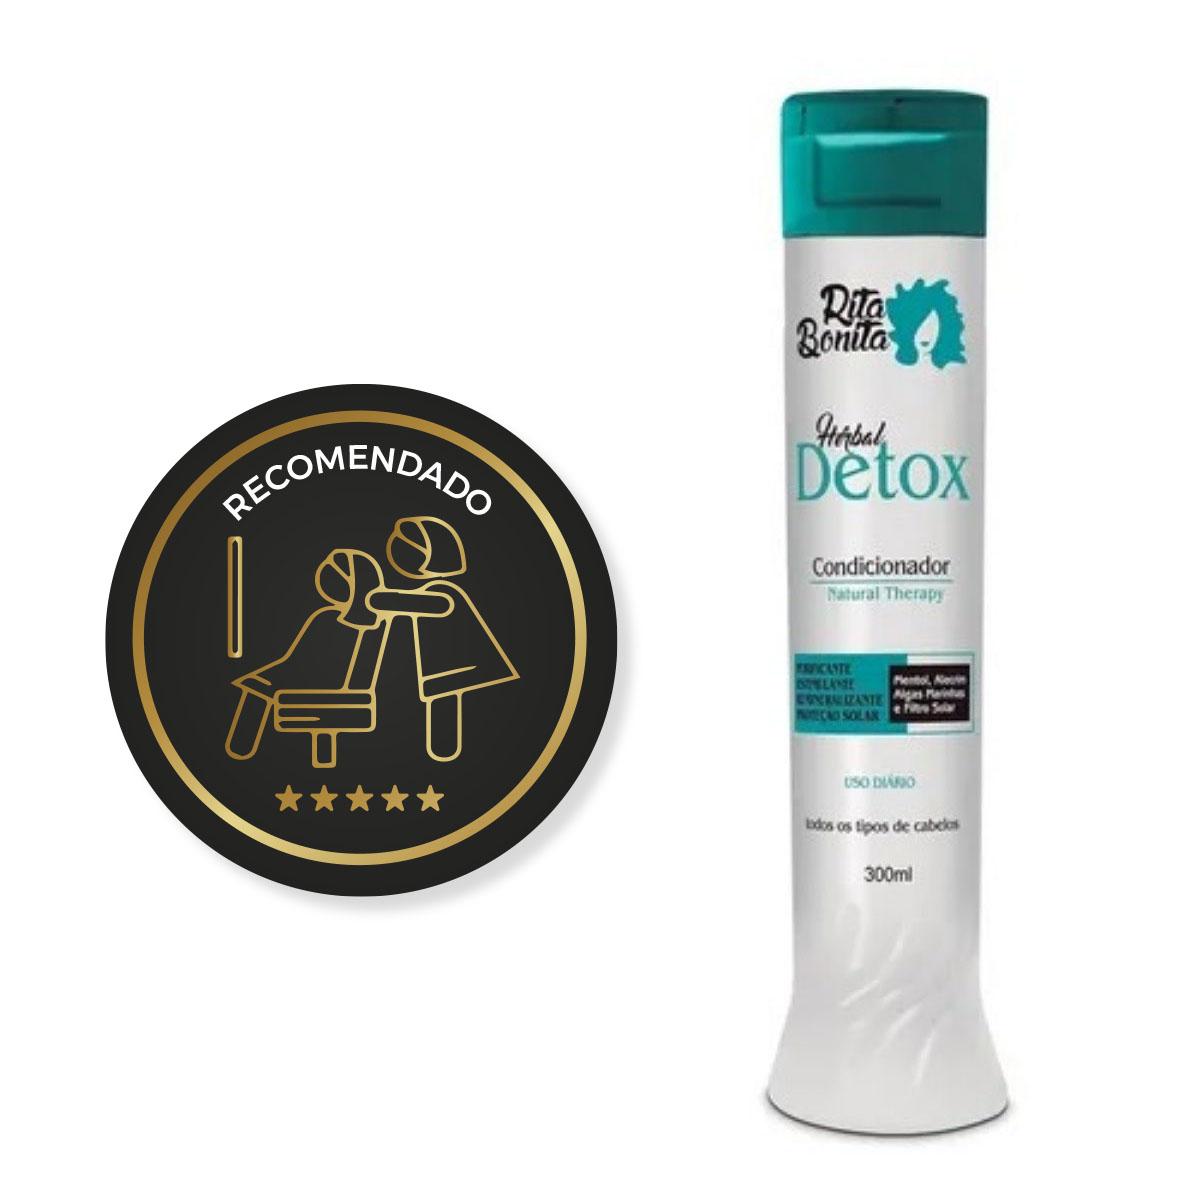 Herbal Detox - Condicionador Rita Bonita 300ml